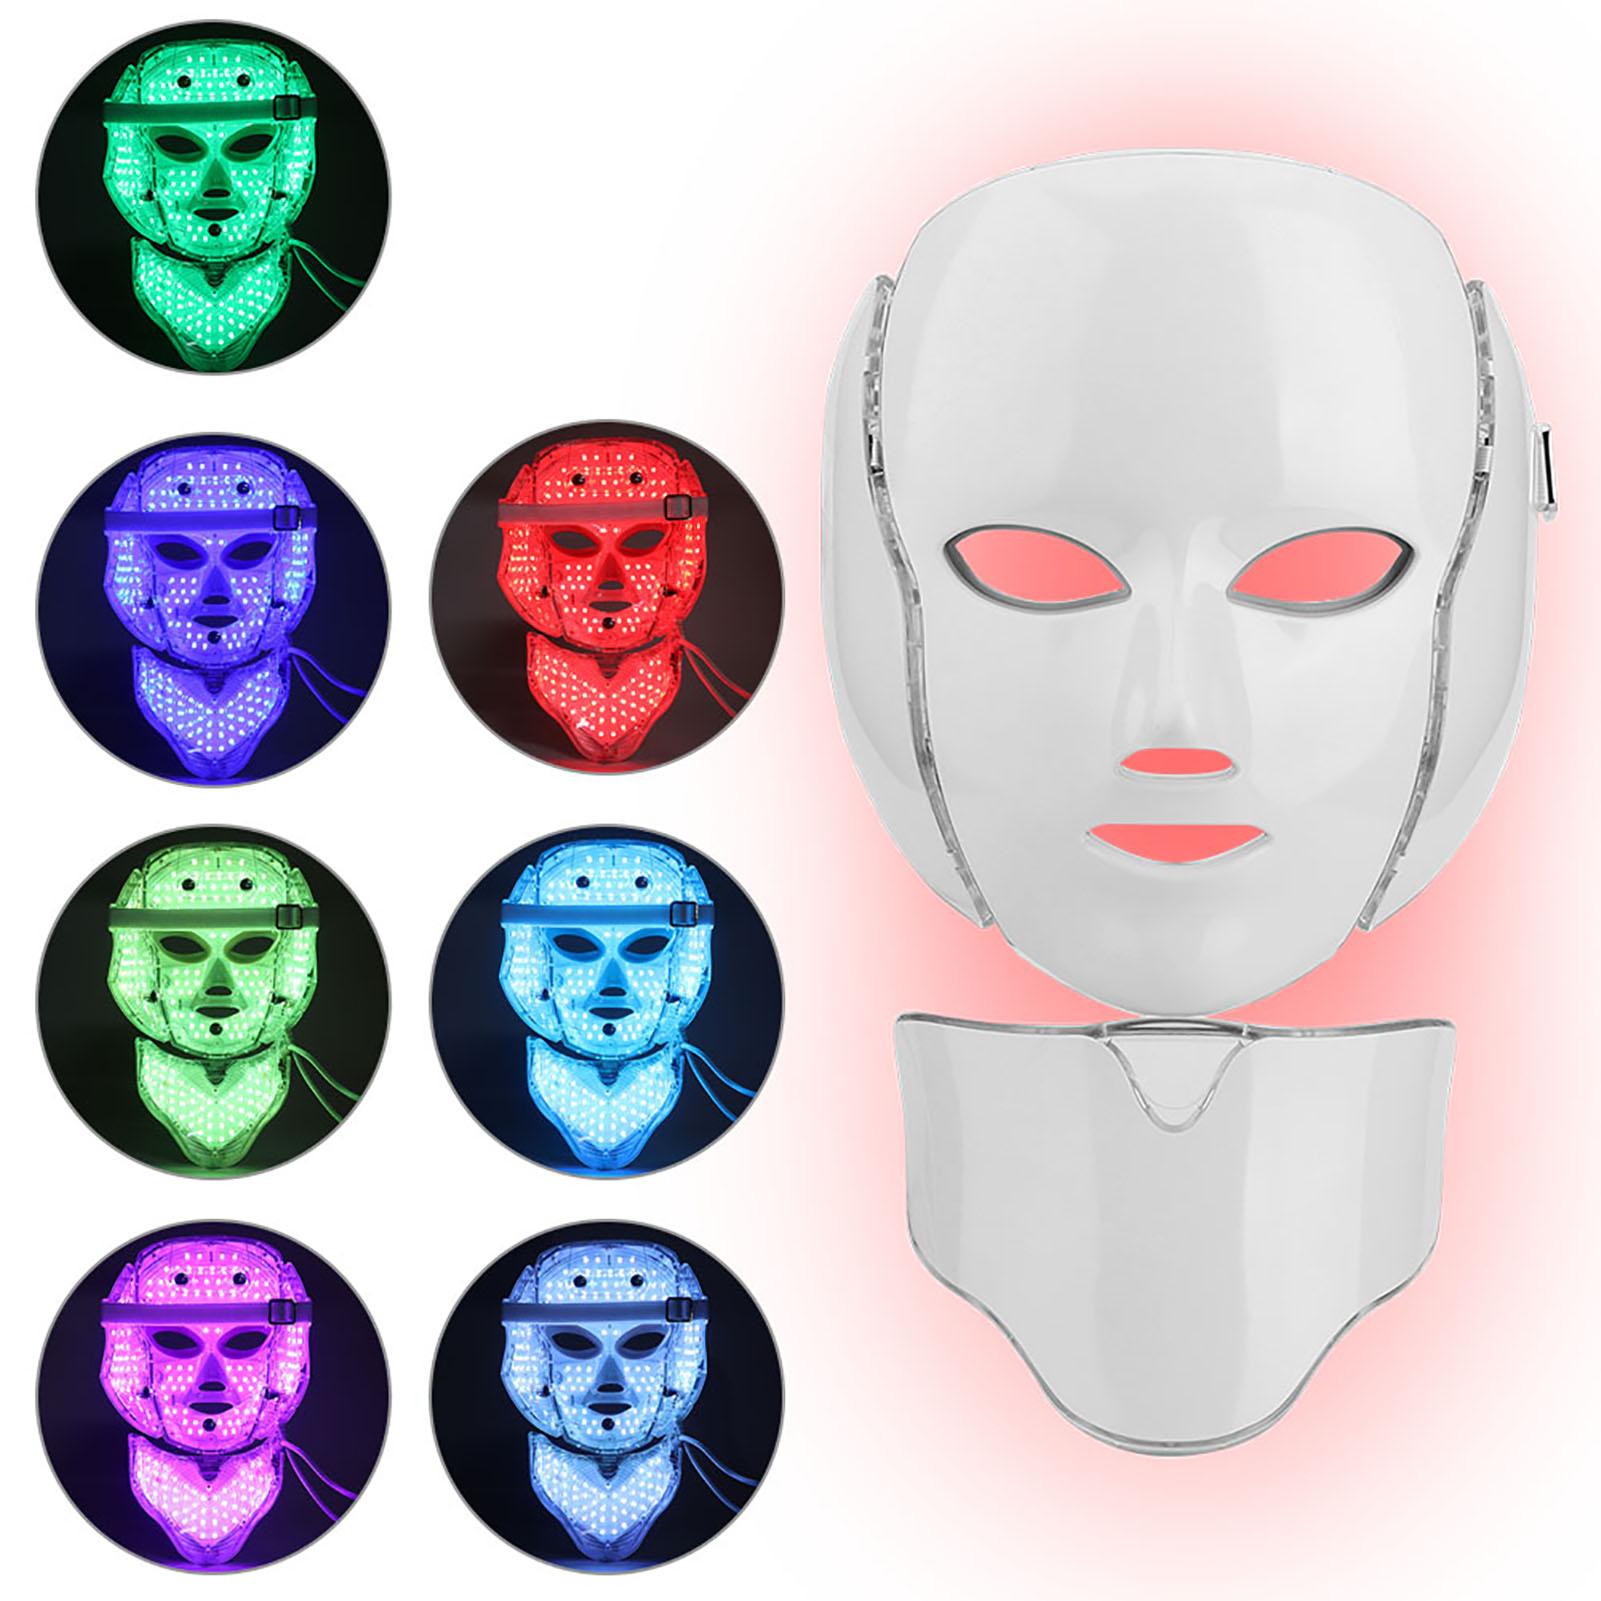 7-Colors-LED-Light-Photodynamic-Facial-Skin-Rejuvenation-Photon-Therapy-Machine miniature 19